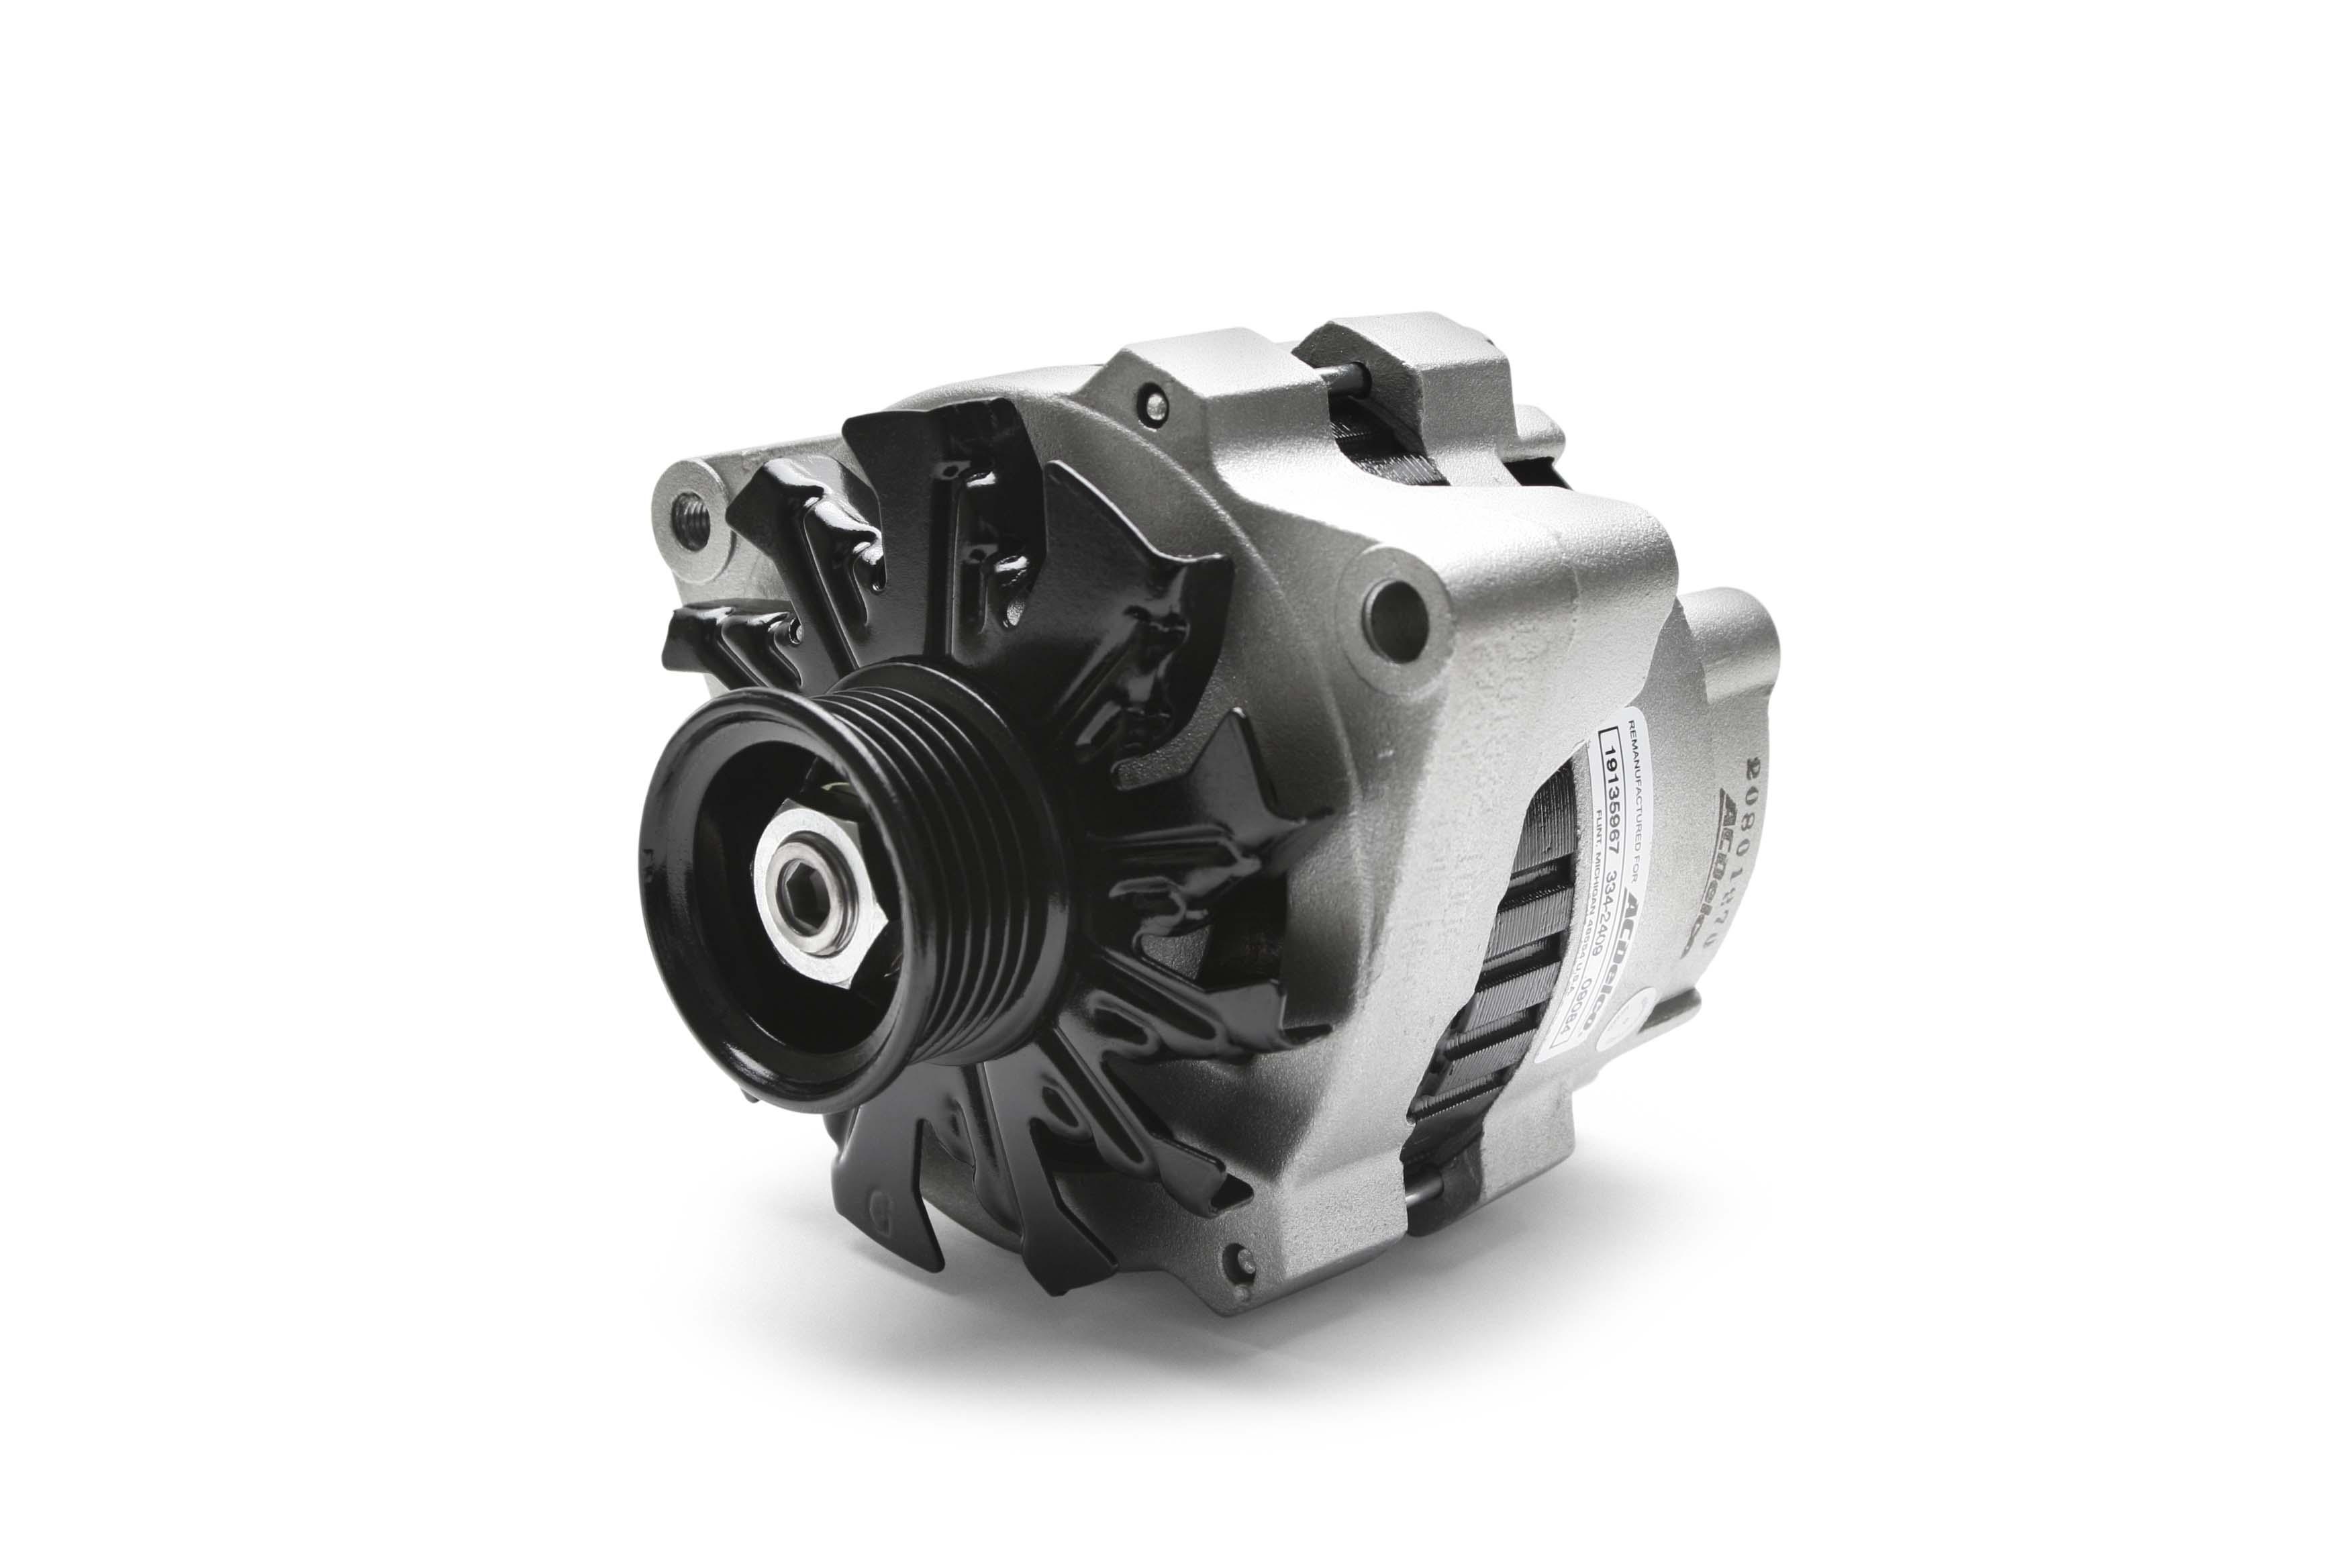 Acdelco Canada Gm Oe Remanufactured Alternators Relay Fuel Pump Gen2 When